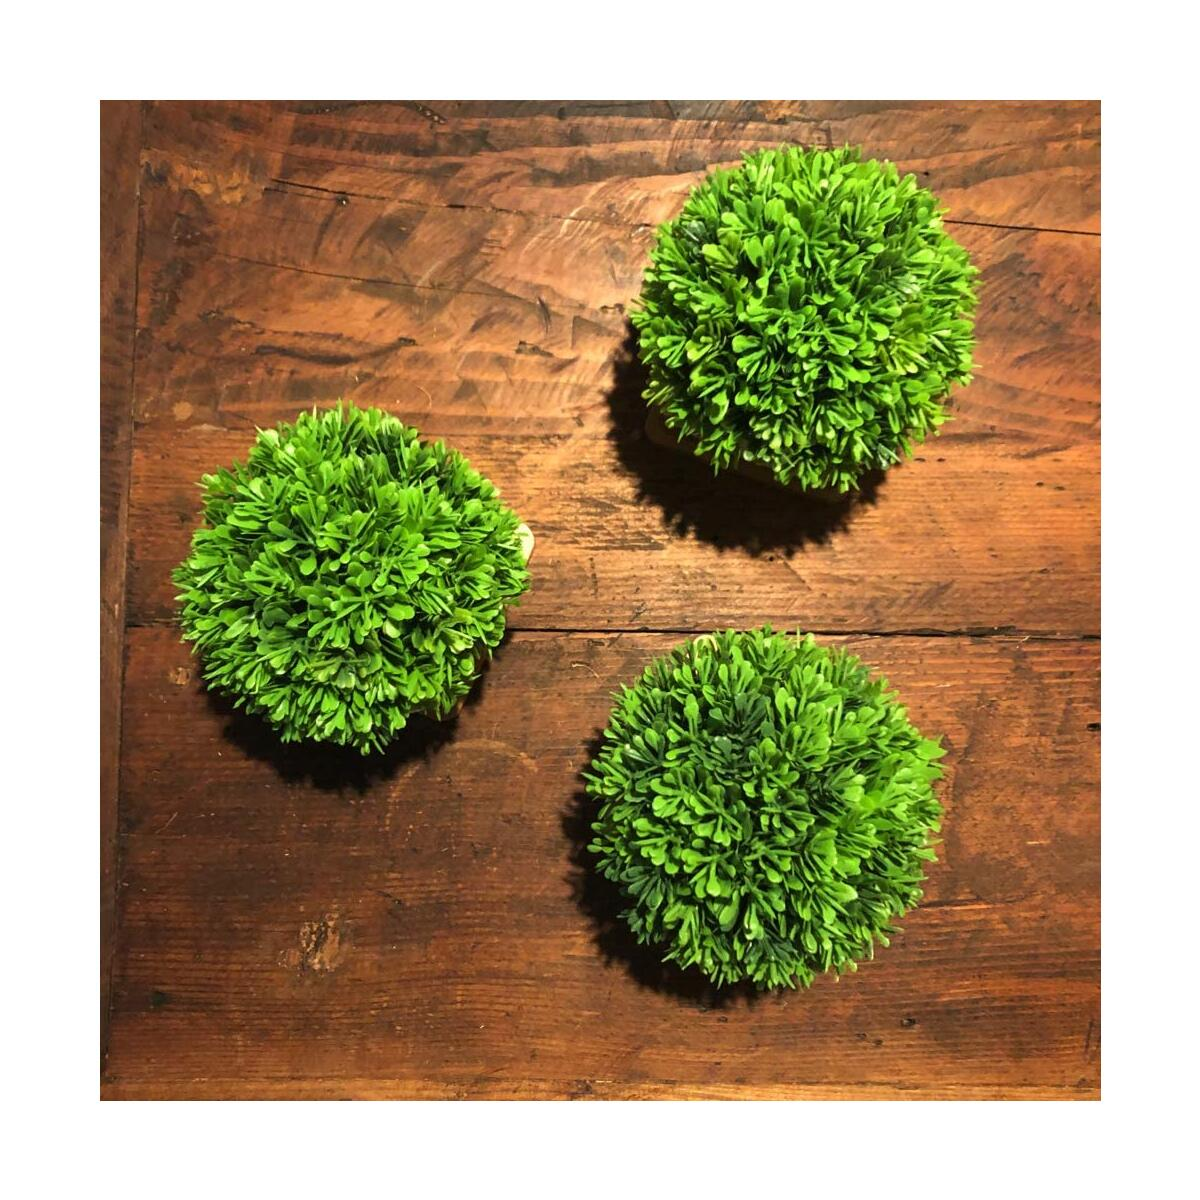 Artificial Plastic Mini Plants Fake in White Ceramic Pot with Bamboo Tray for Home Decor